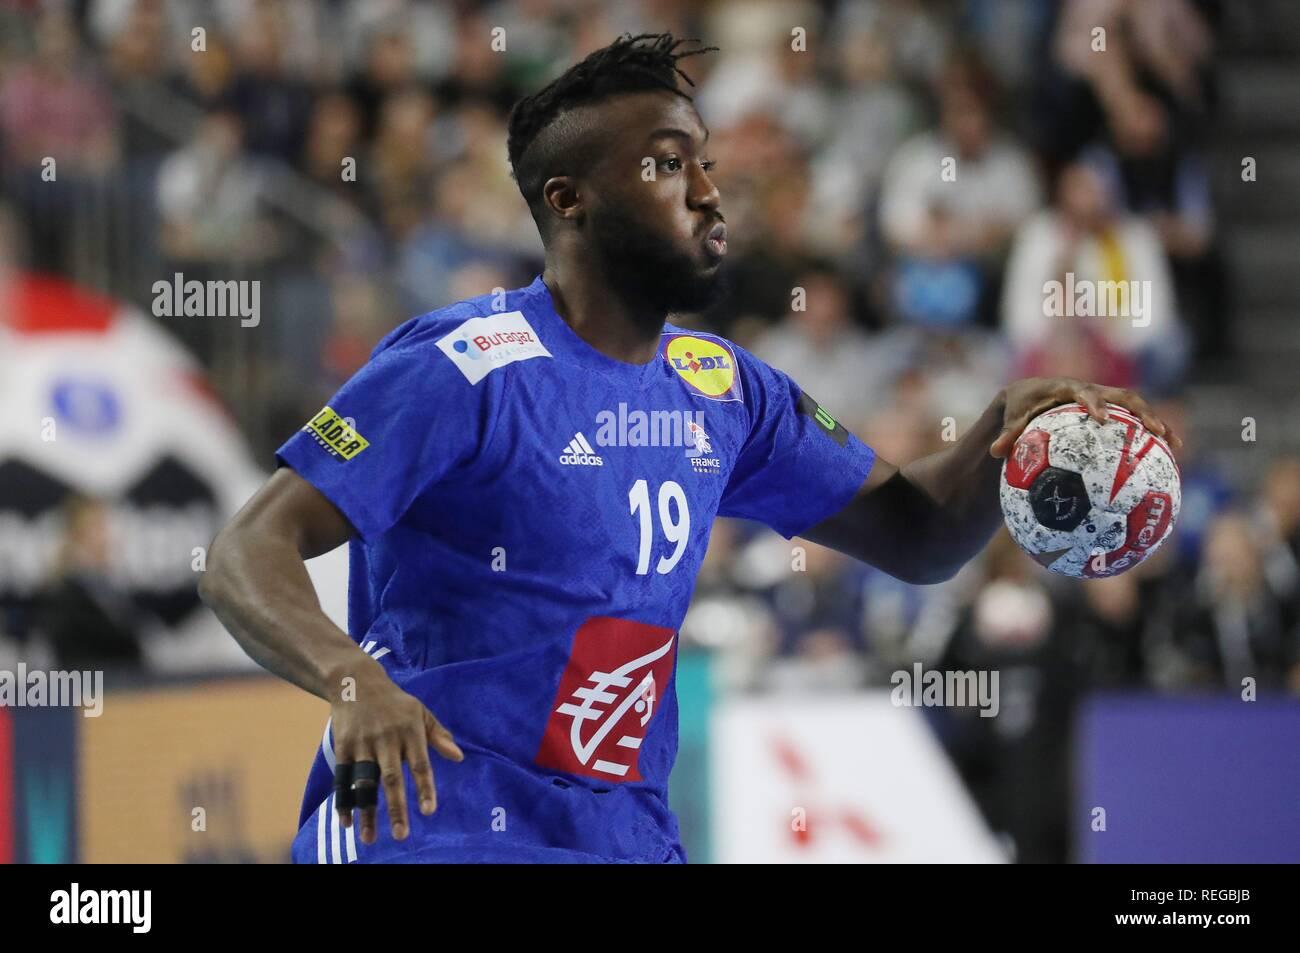 firo: 19.01.2019, Handball: World Cup World Cup Main Round France - Spain Single Action, Luc Abalo, FRA   usage worldwide - Stock Image